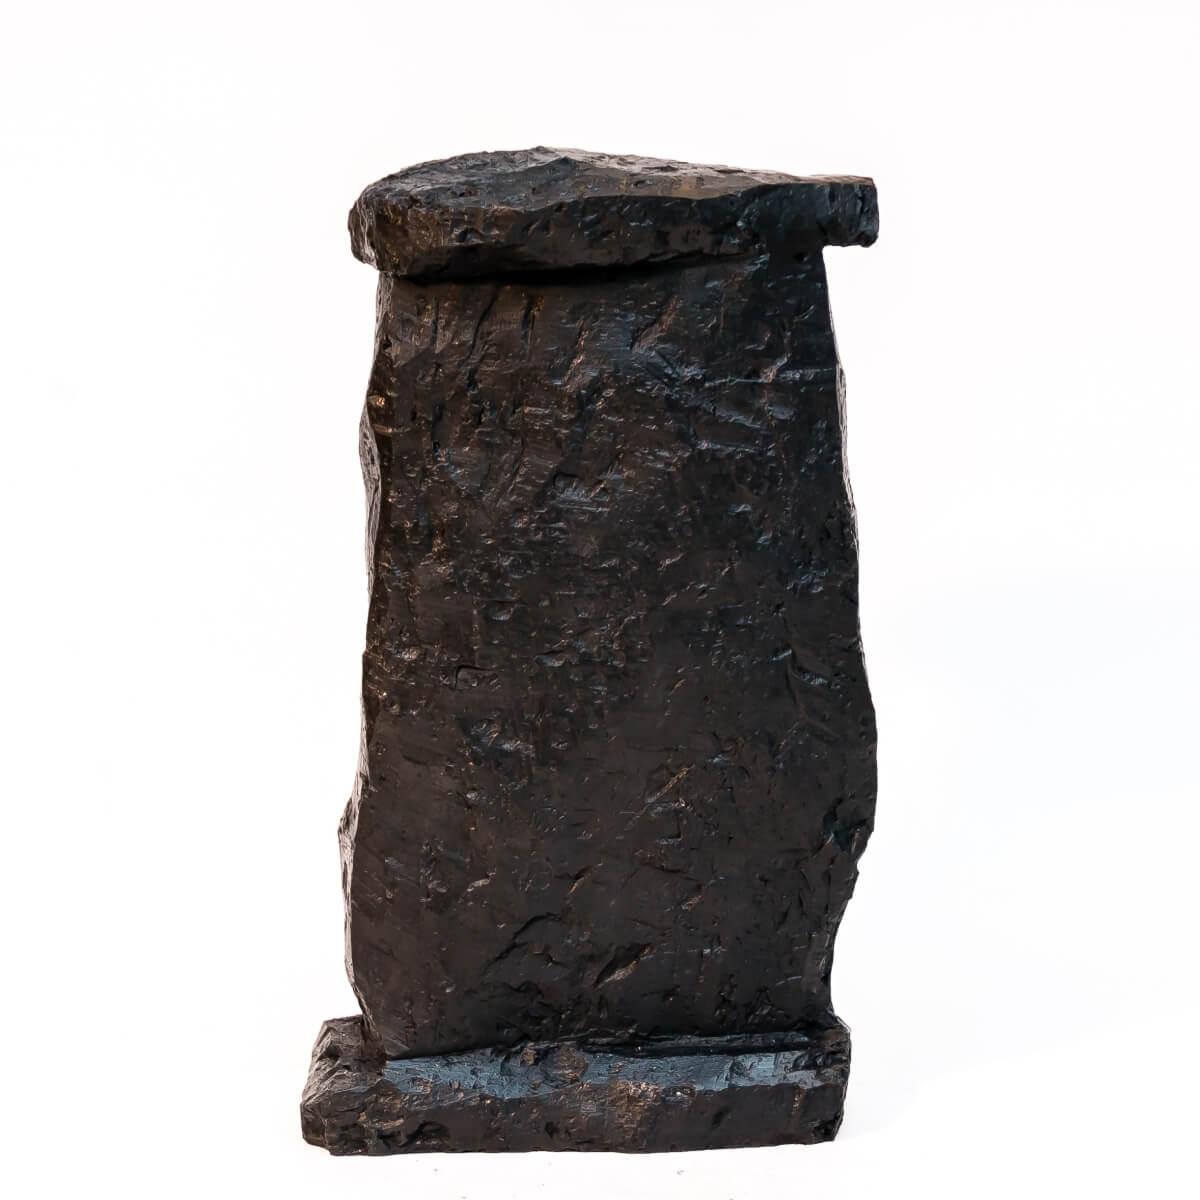 Górnik na węglu